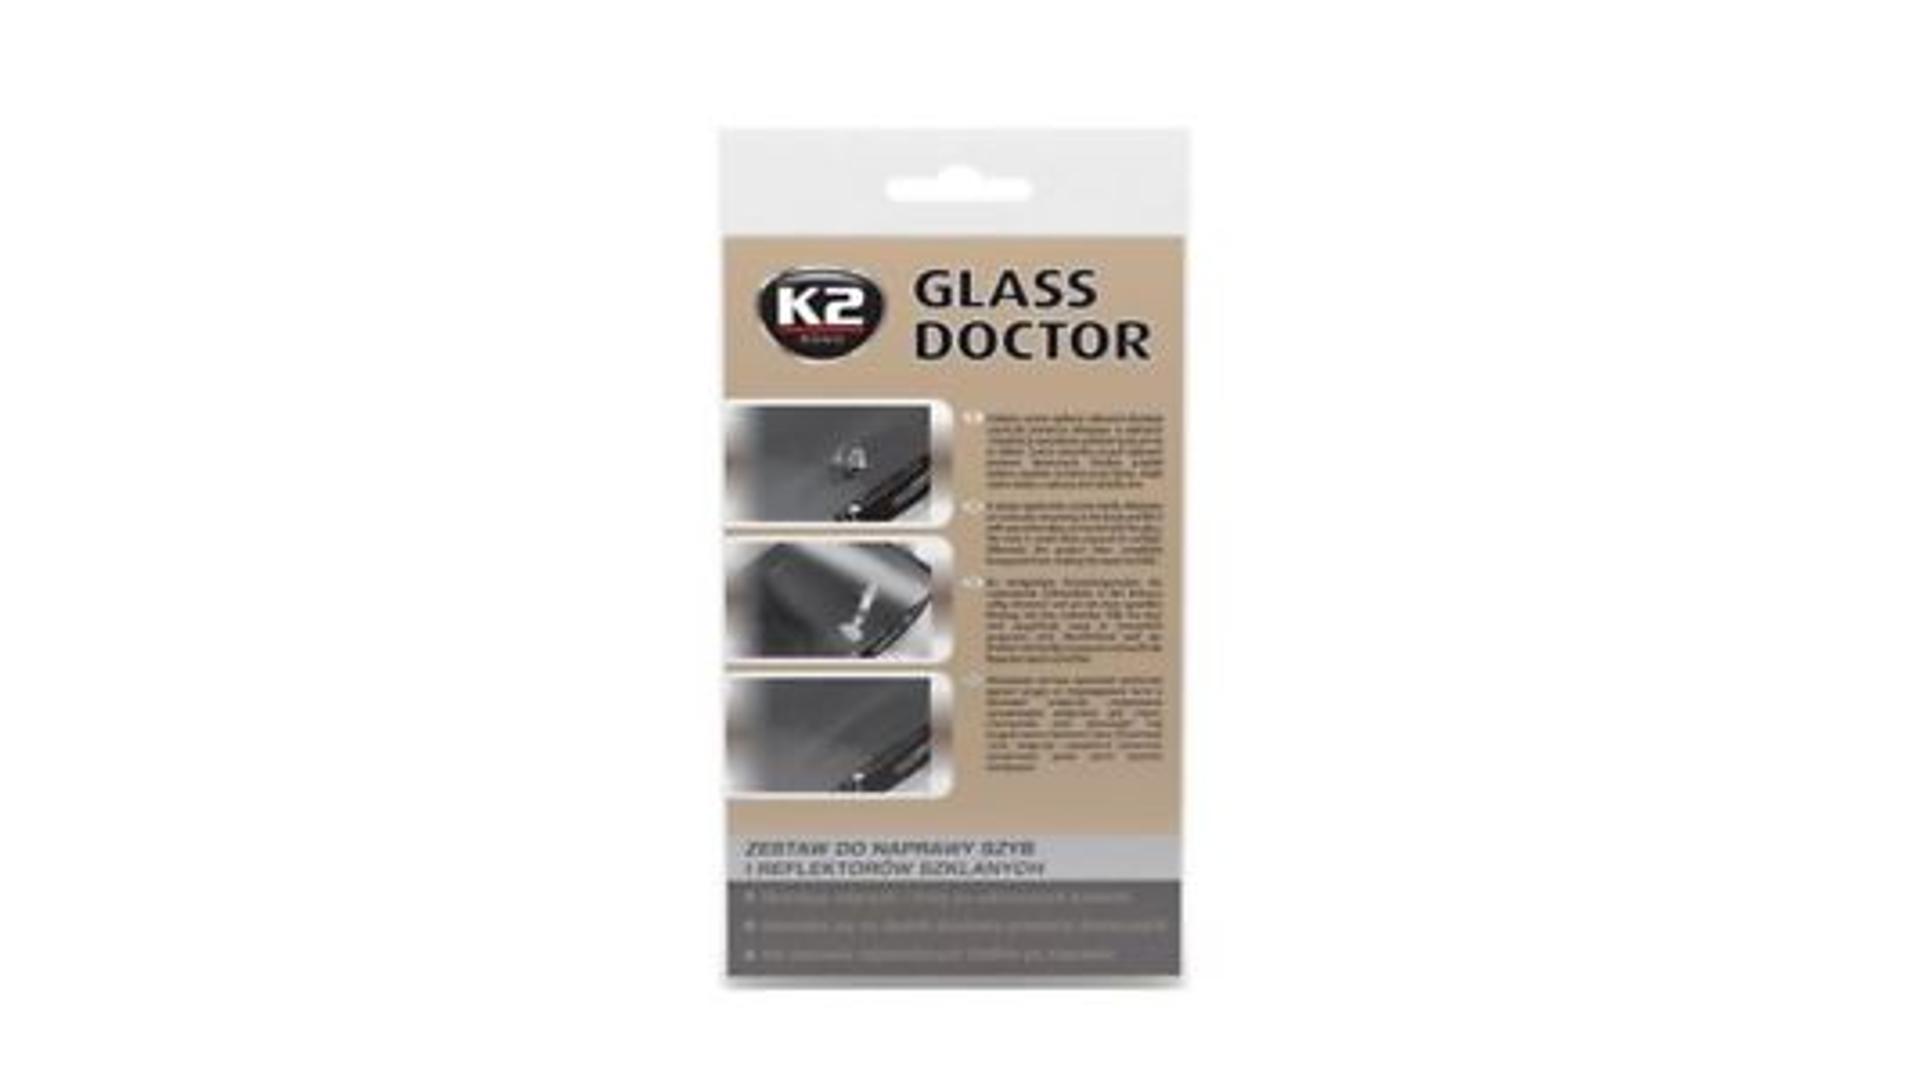 K2 Glass Doctor